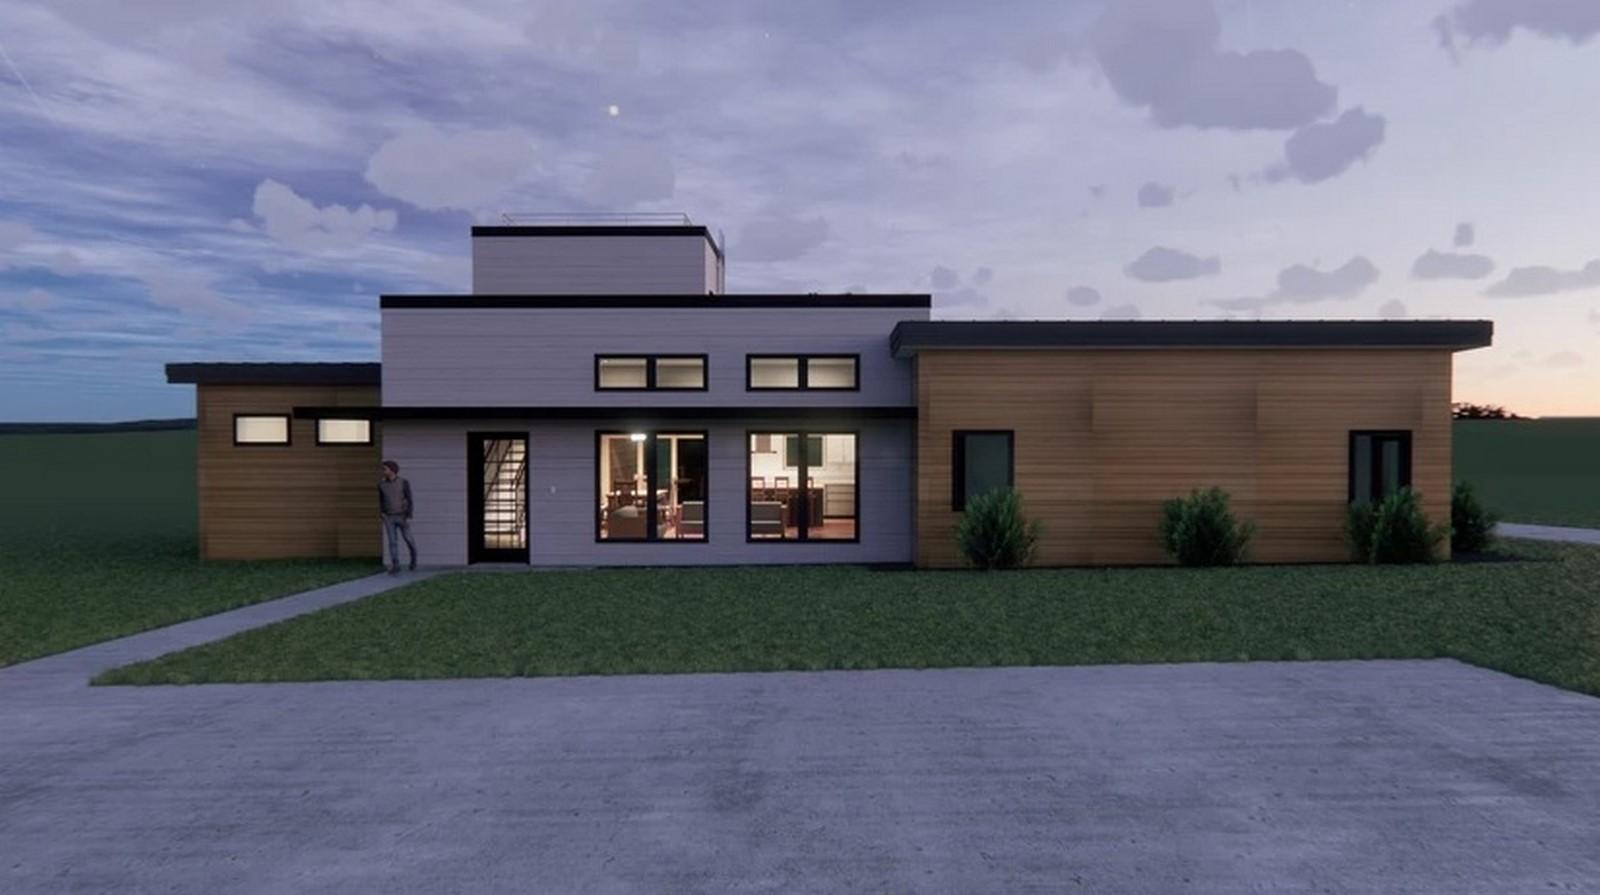 Architects in Kansas city - Top 90 Architects in Kansas city - Sheet86